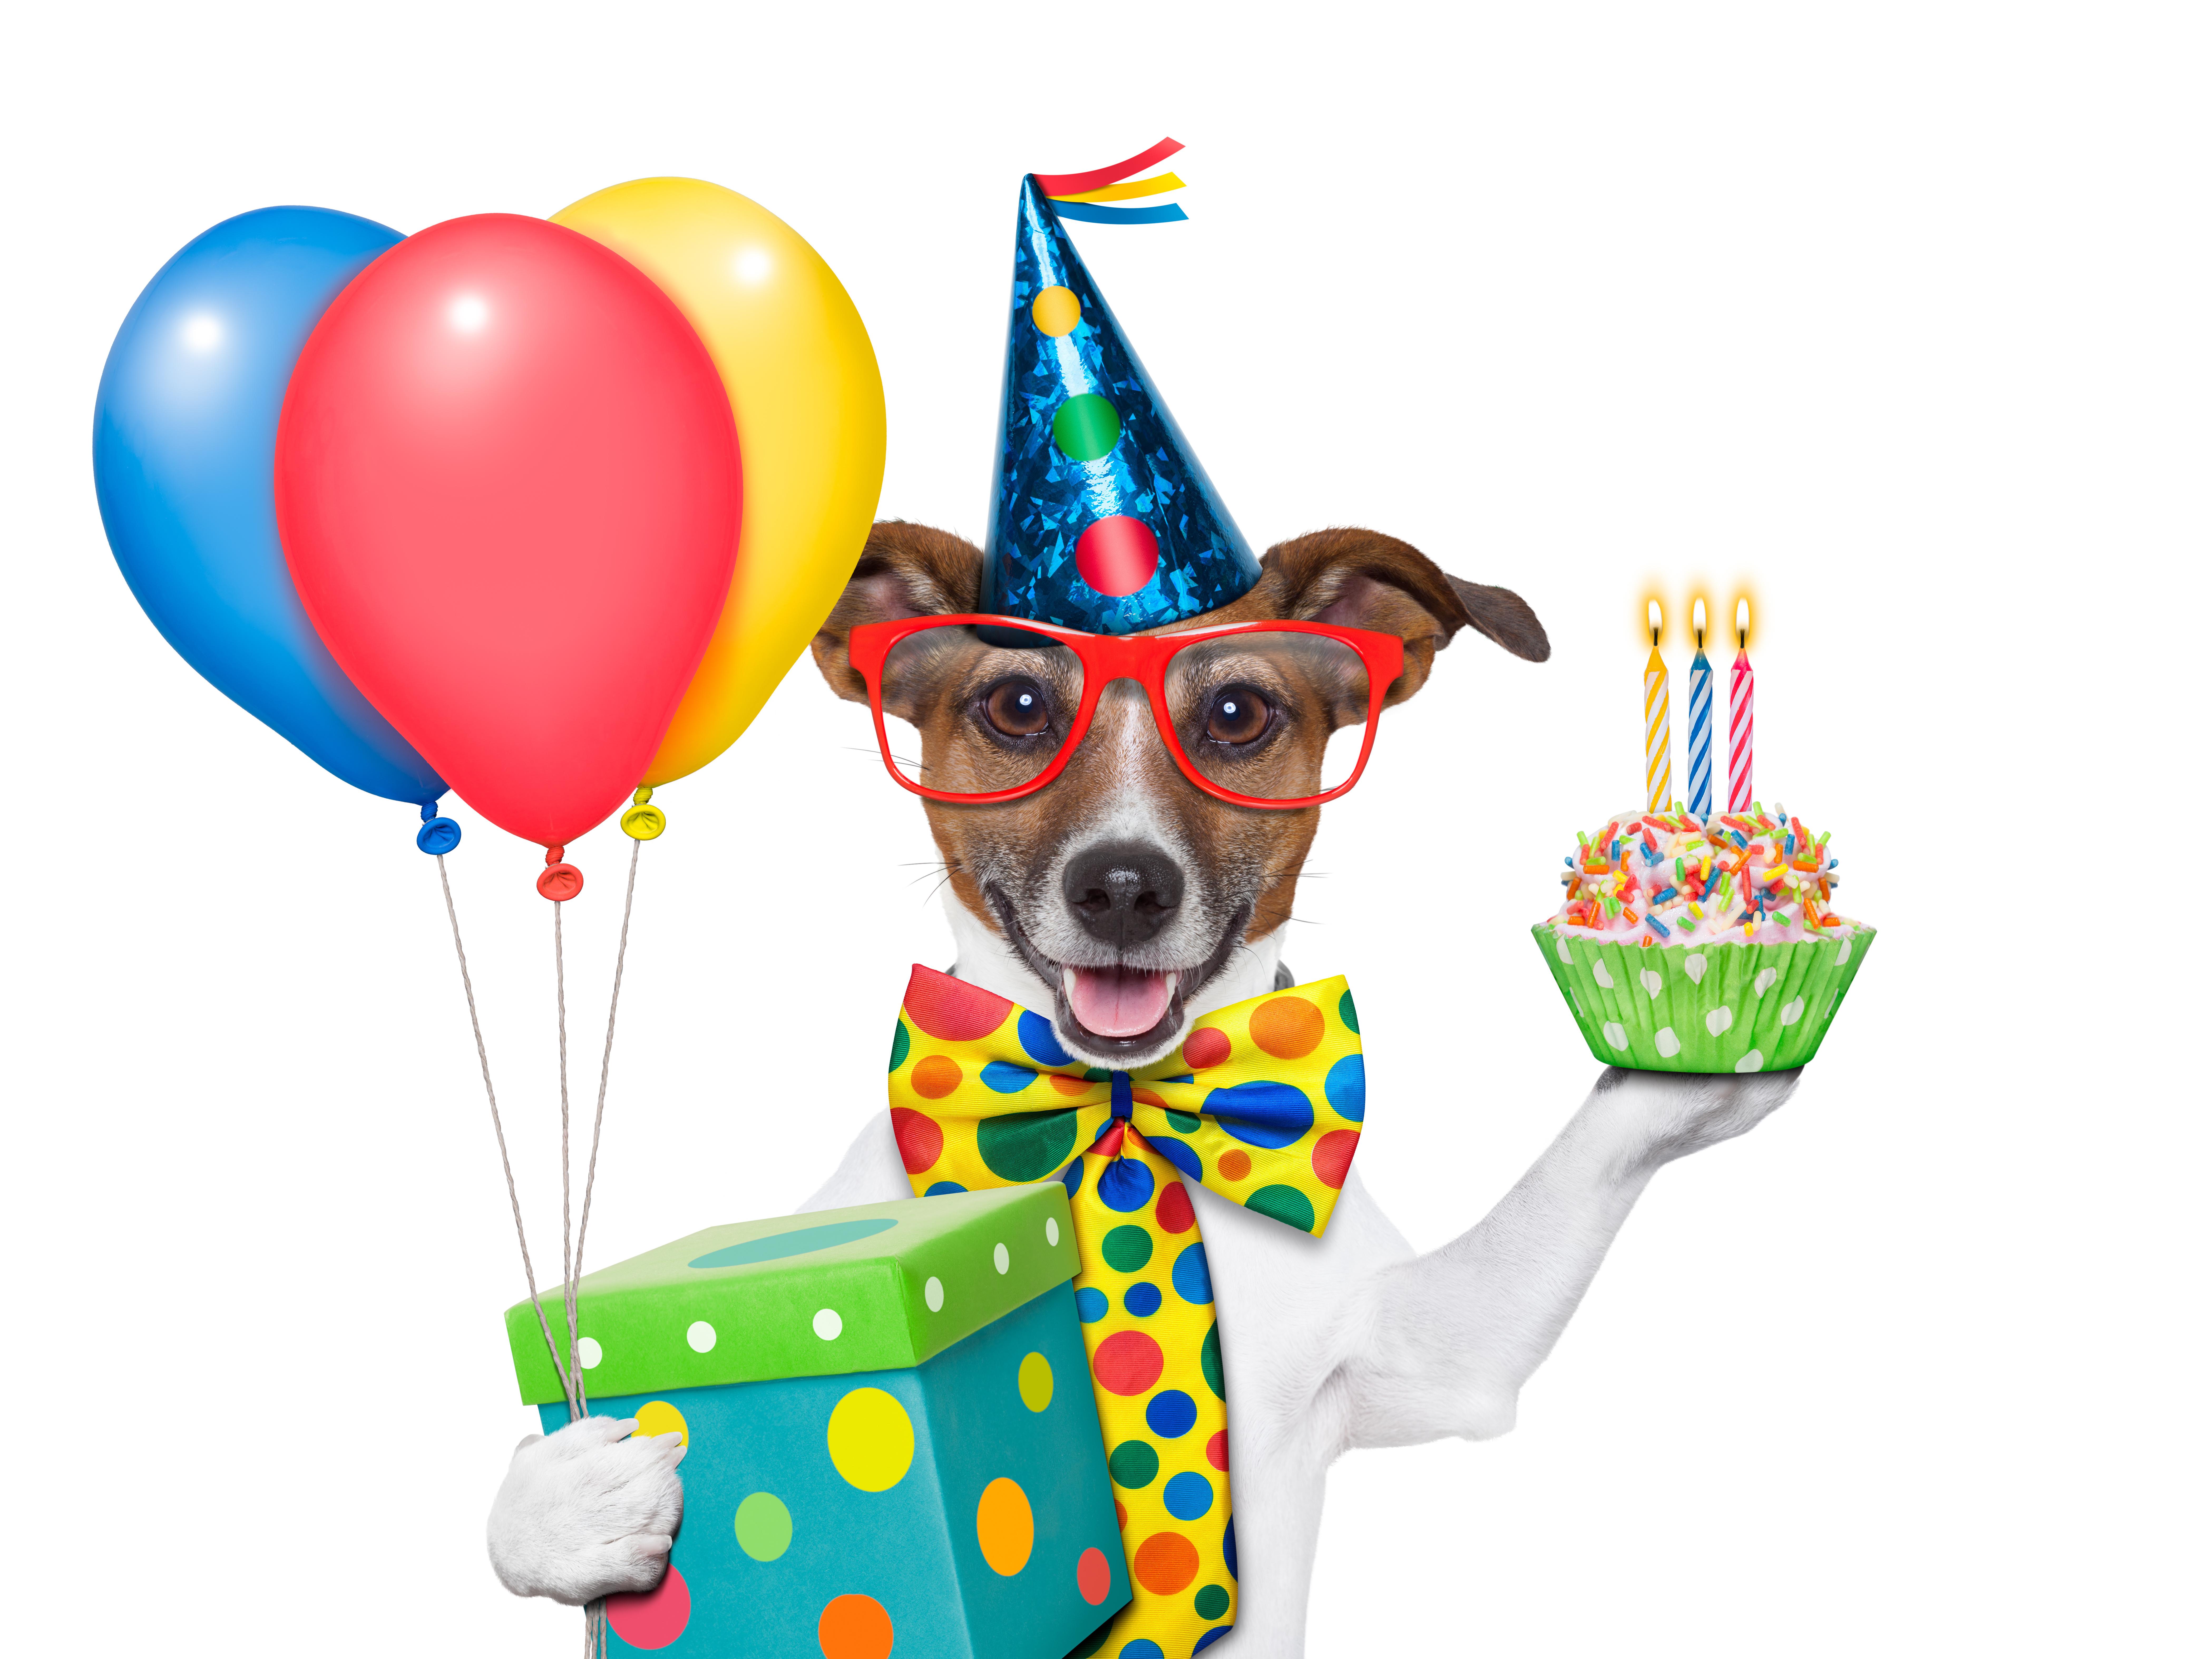 Cheerful dog on birthday